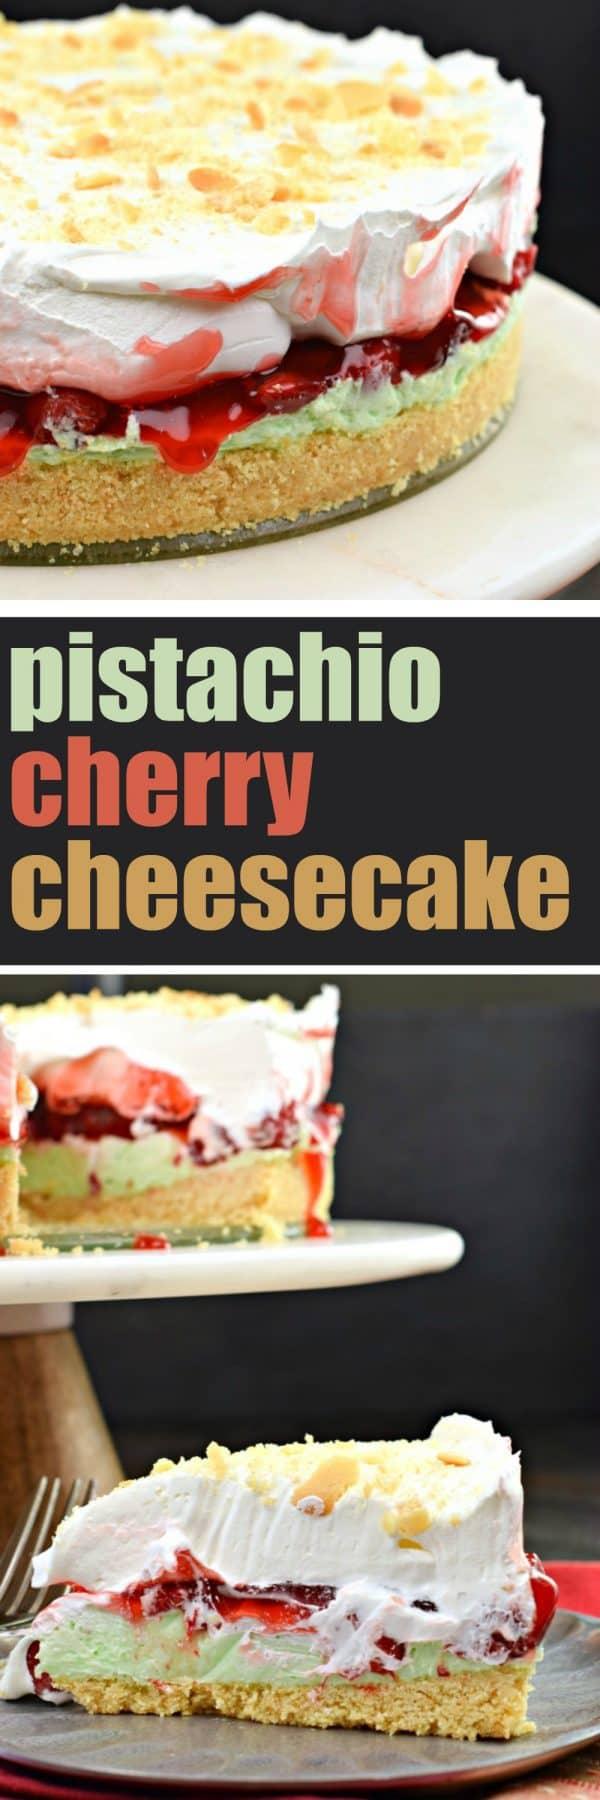 No Bake Pistachio Cherry Cheesecake recipe #holidays #christmas #cheesecake #christmasbaking #christmasrecipes #pistachio